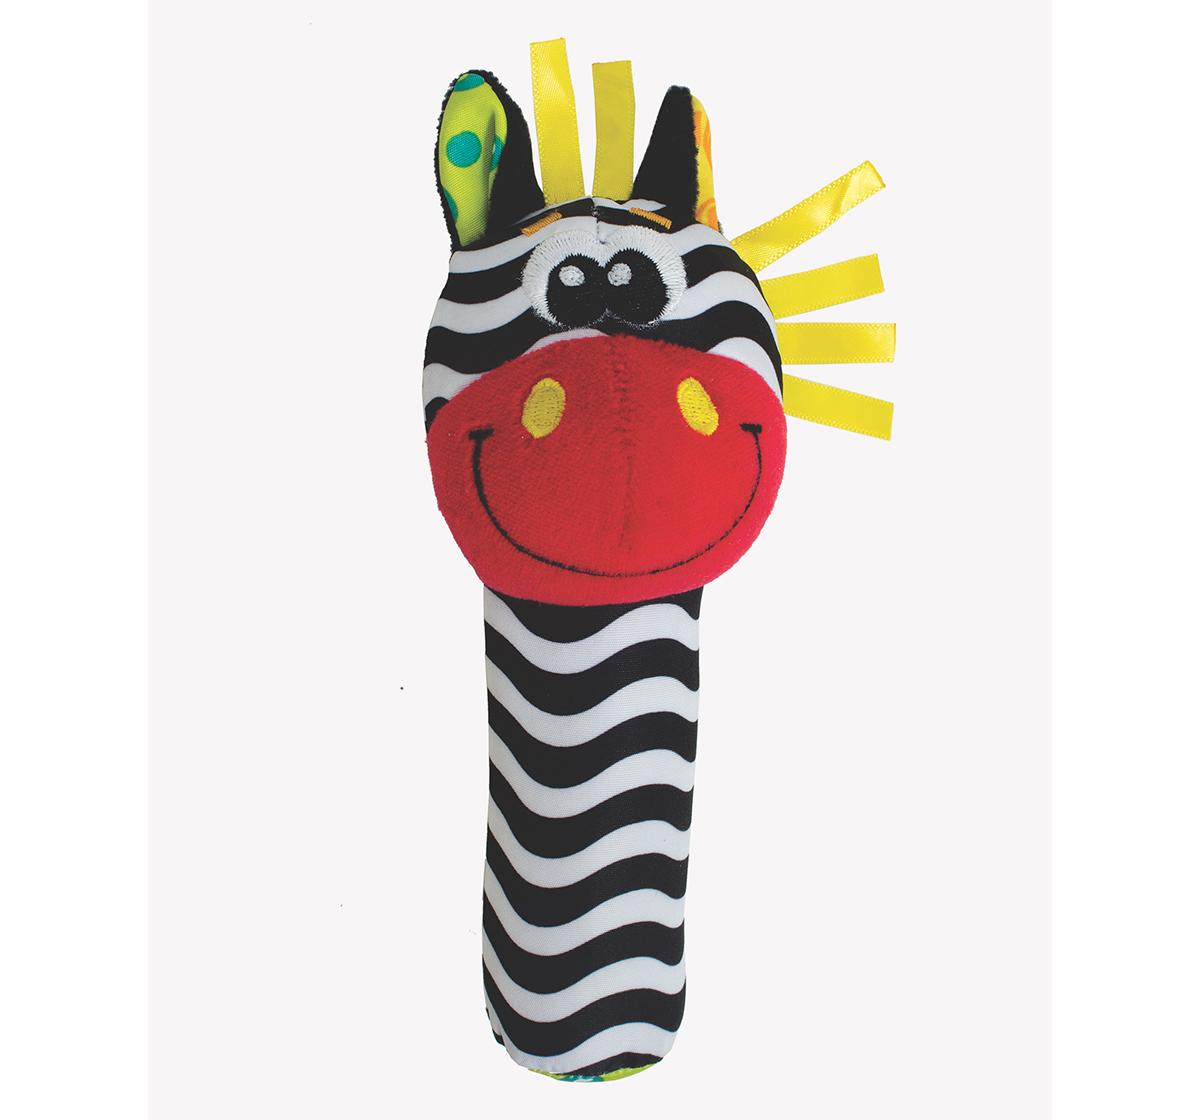 Playgro   Playgro Jungle Squeaker Zebra New Born for Kids age 3M+ (Black)